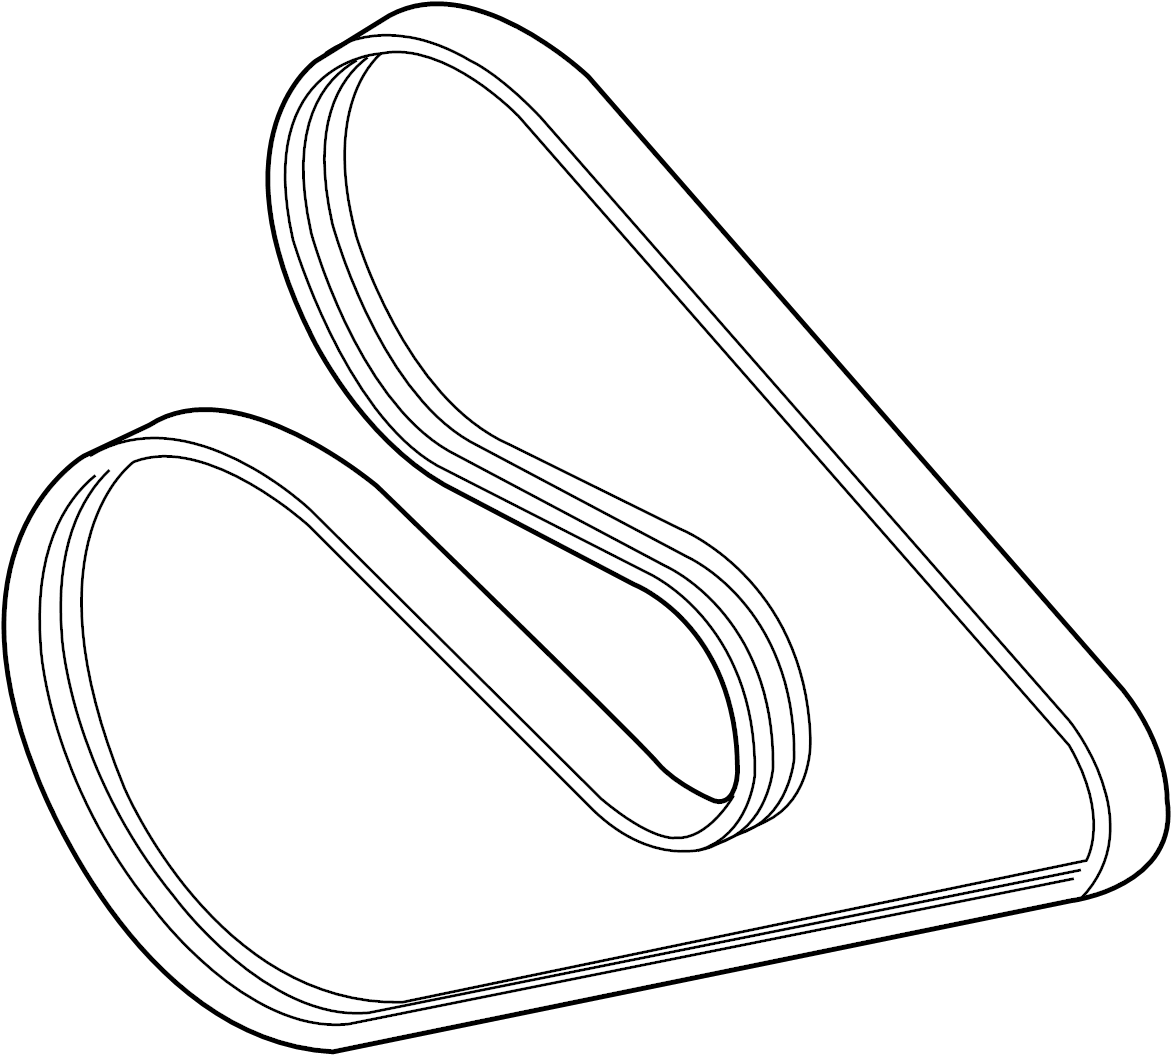 tags: #serpentine belt ac bypass#serpentine belt tensioner#2003 mustang  serpentine belt#2007 mustang gt serpentine belt#mustang intake manifold#95  mustang